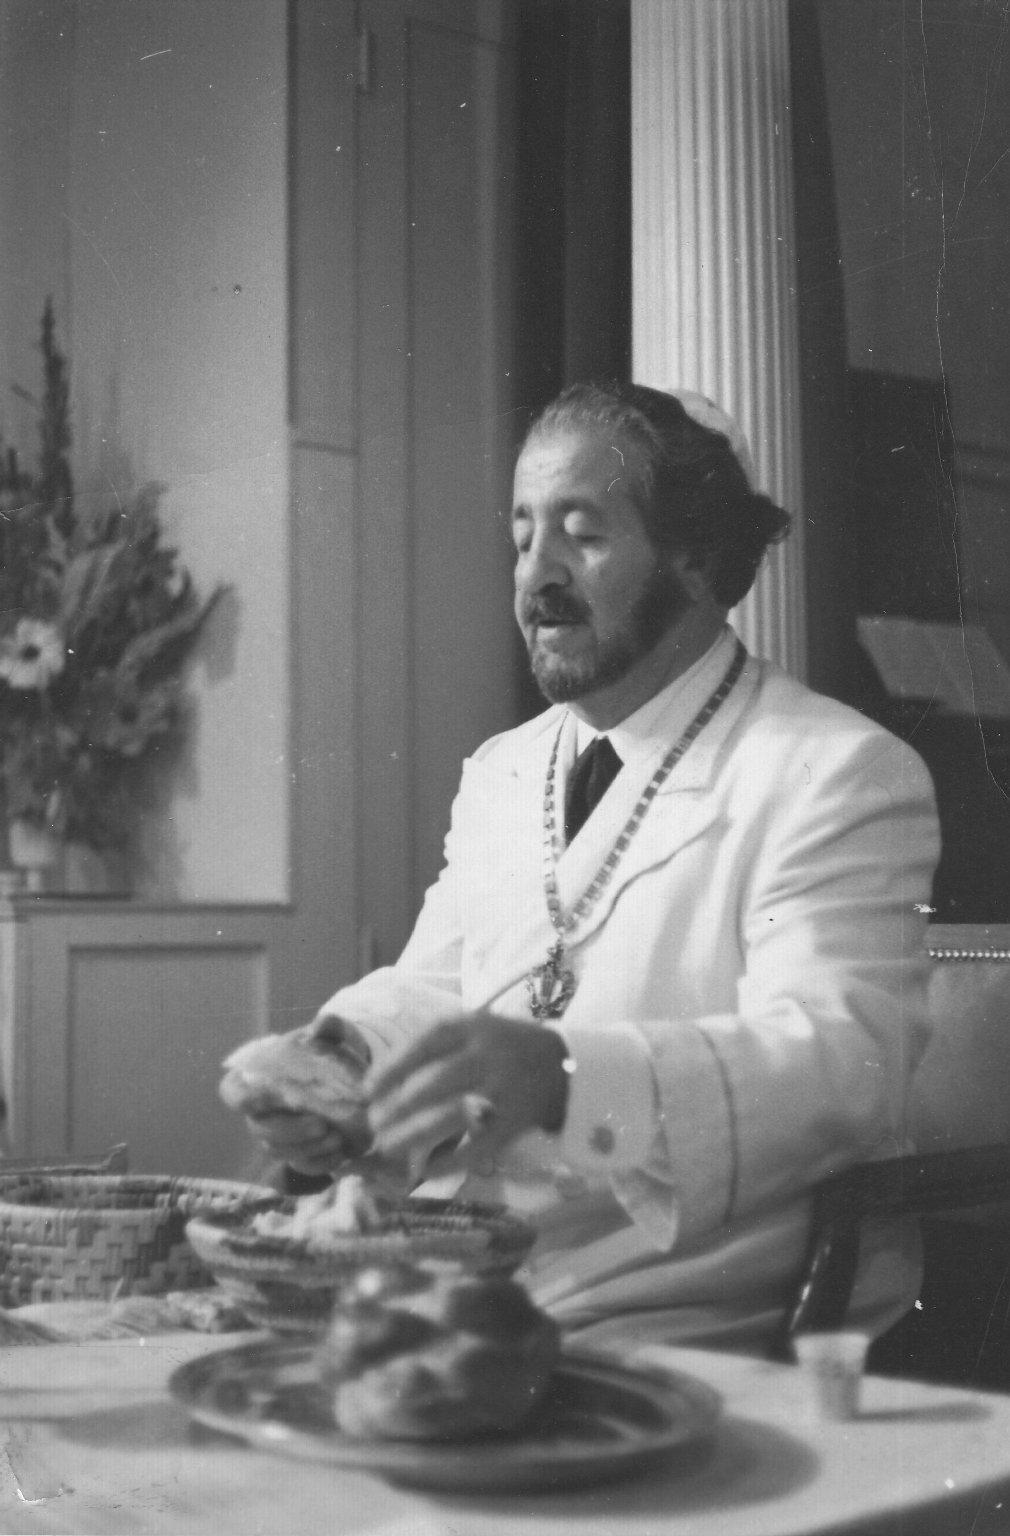 Rabbi Joseph Gelberman tearing hallah.